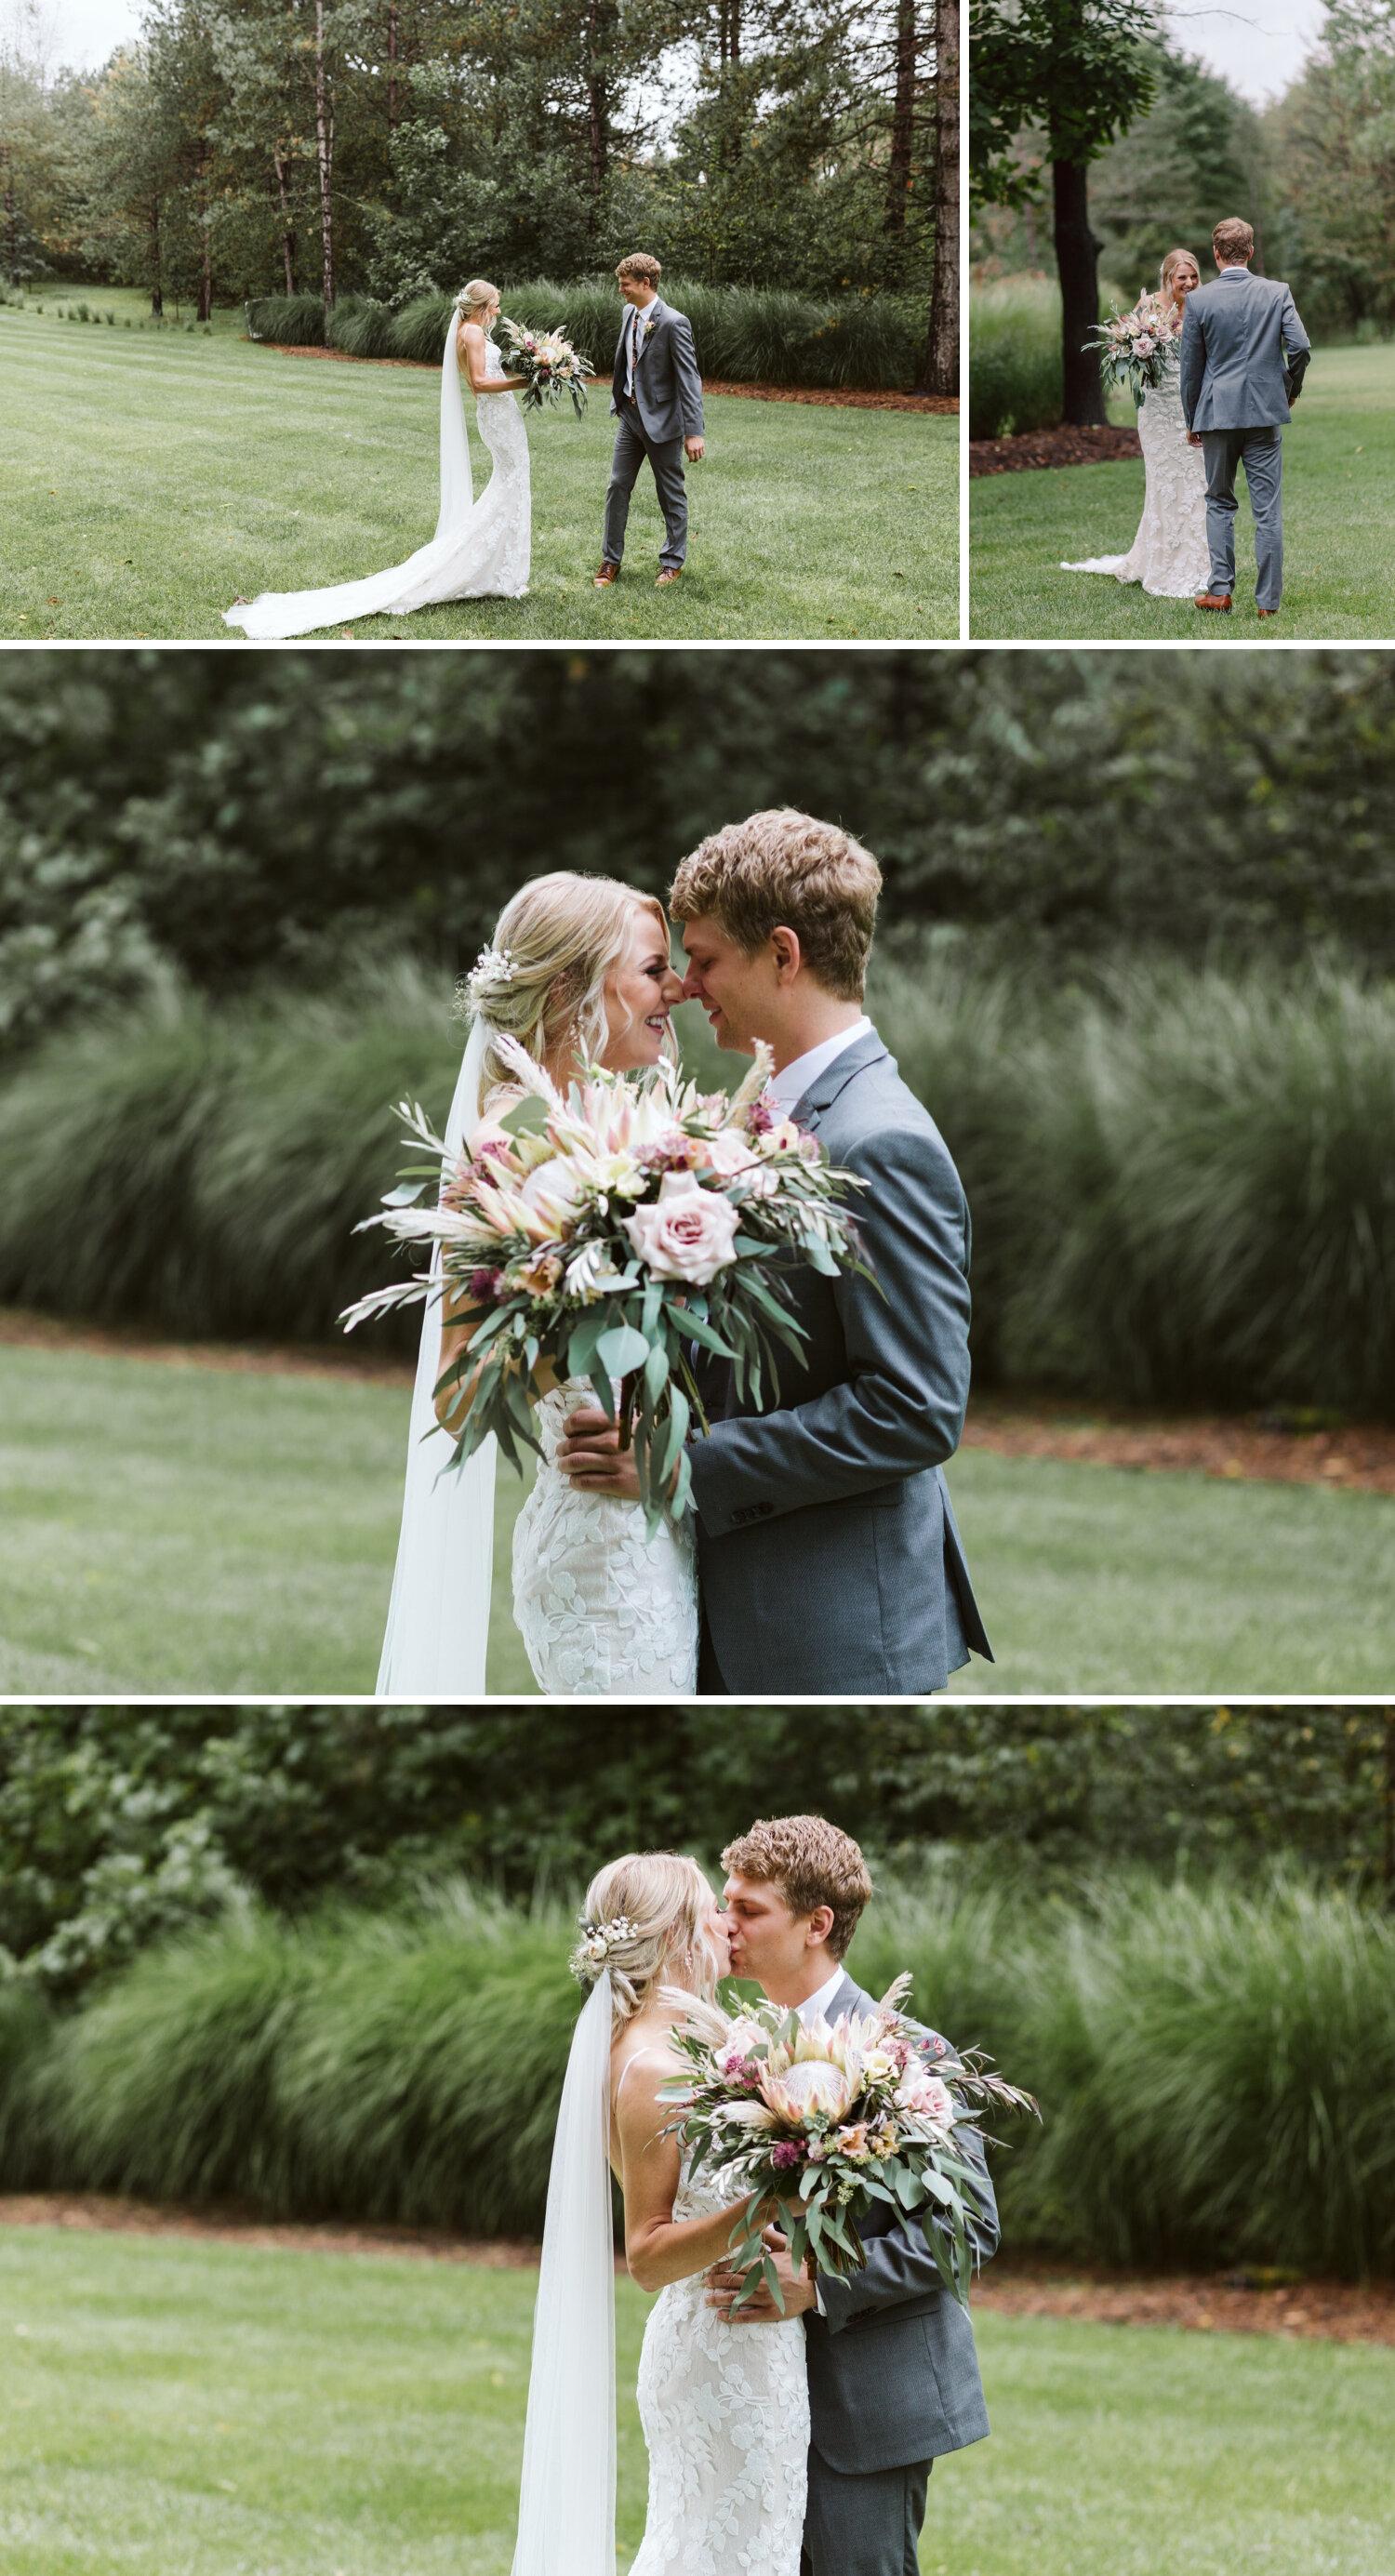 Wedding photographer in Grand Rapids MI